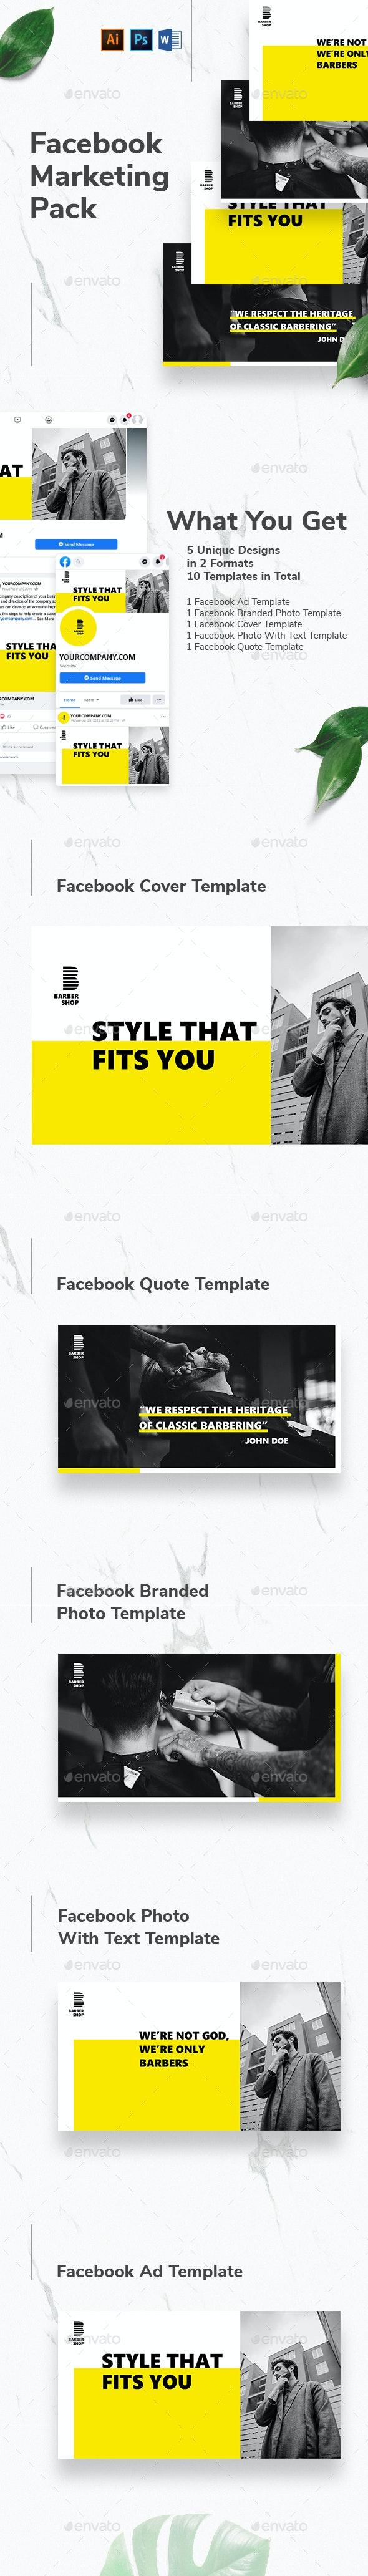 Barbershop Facebook Marketing Materials - Facebook Timeline Covers Social Media